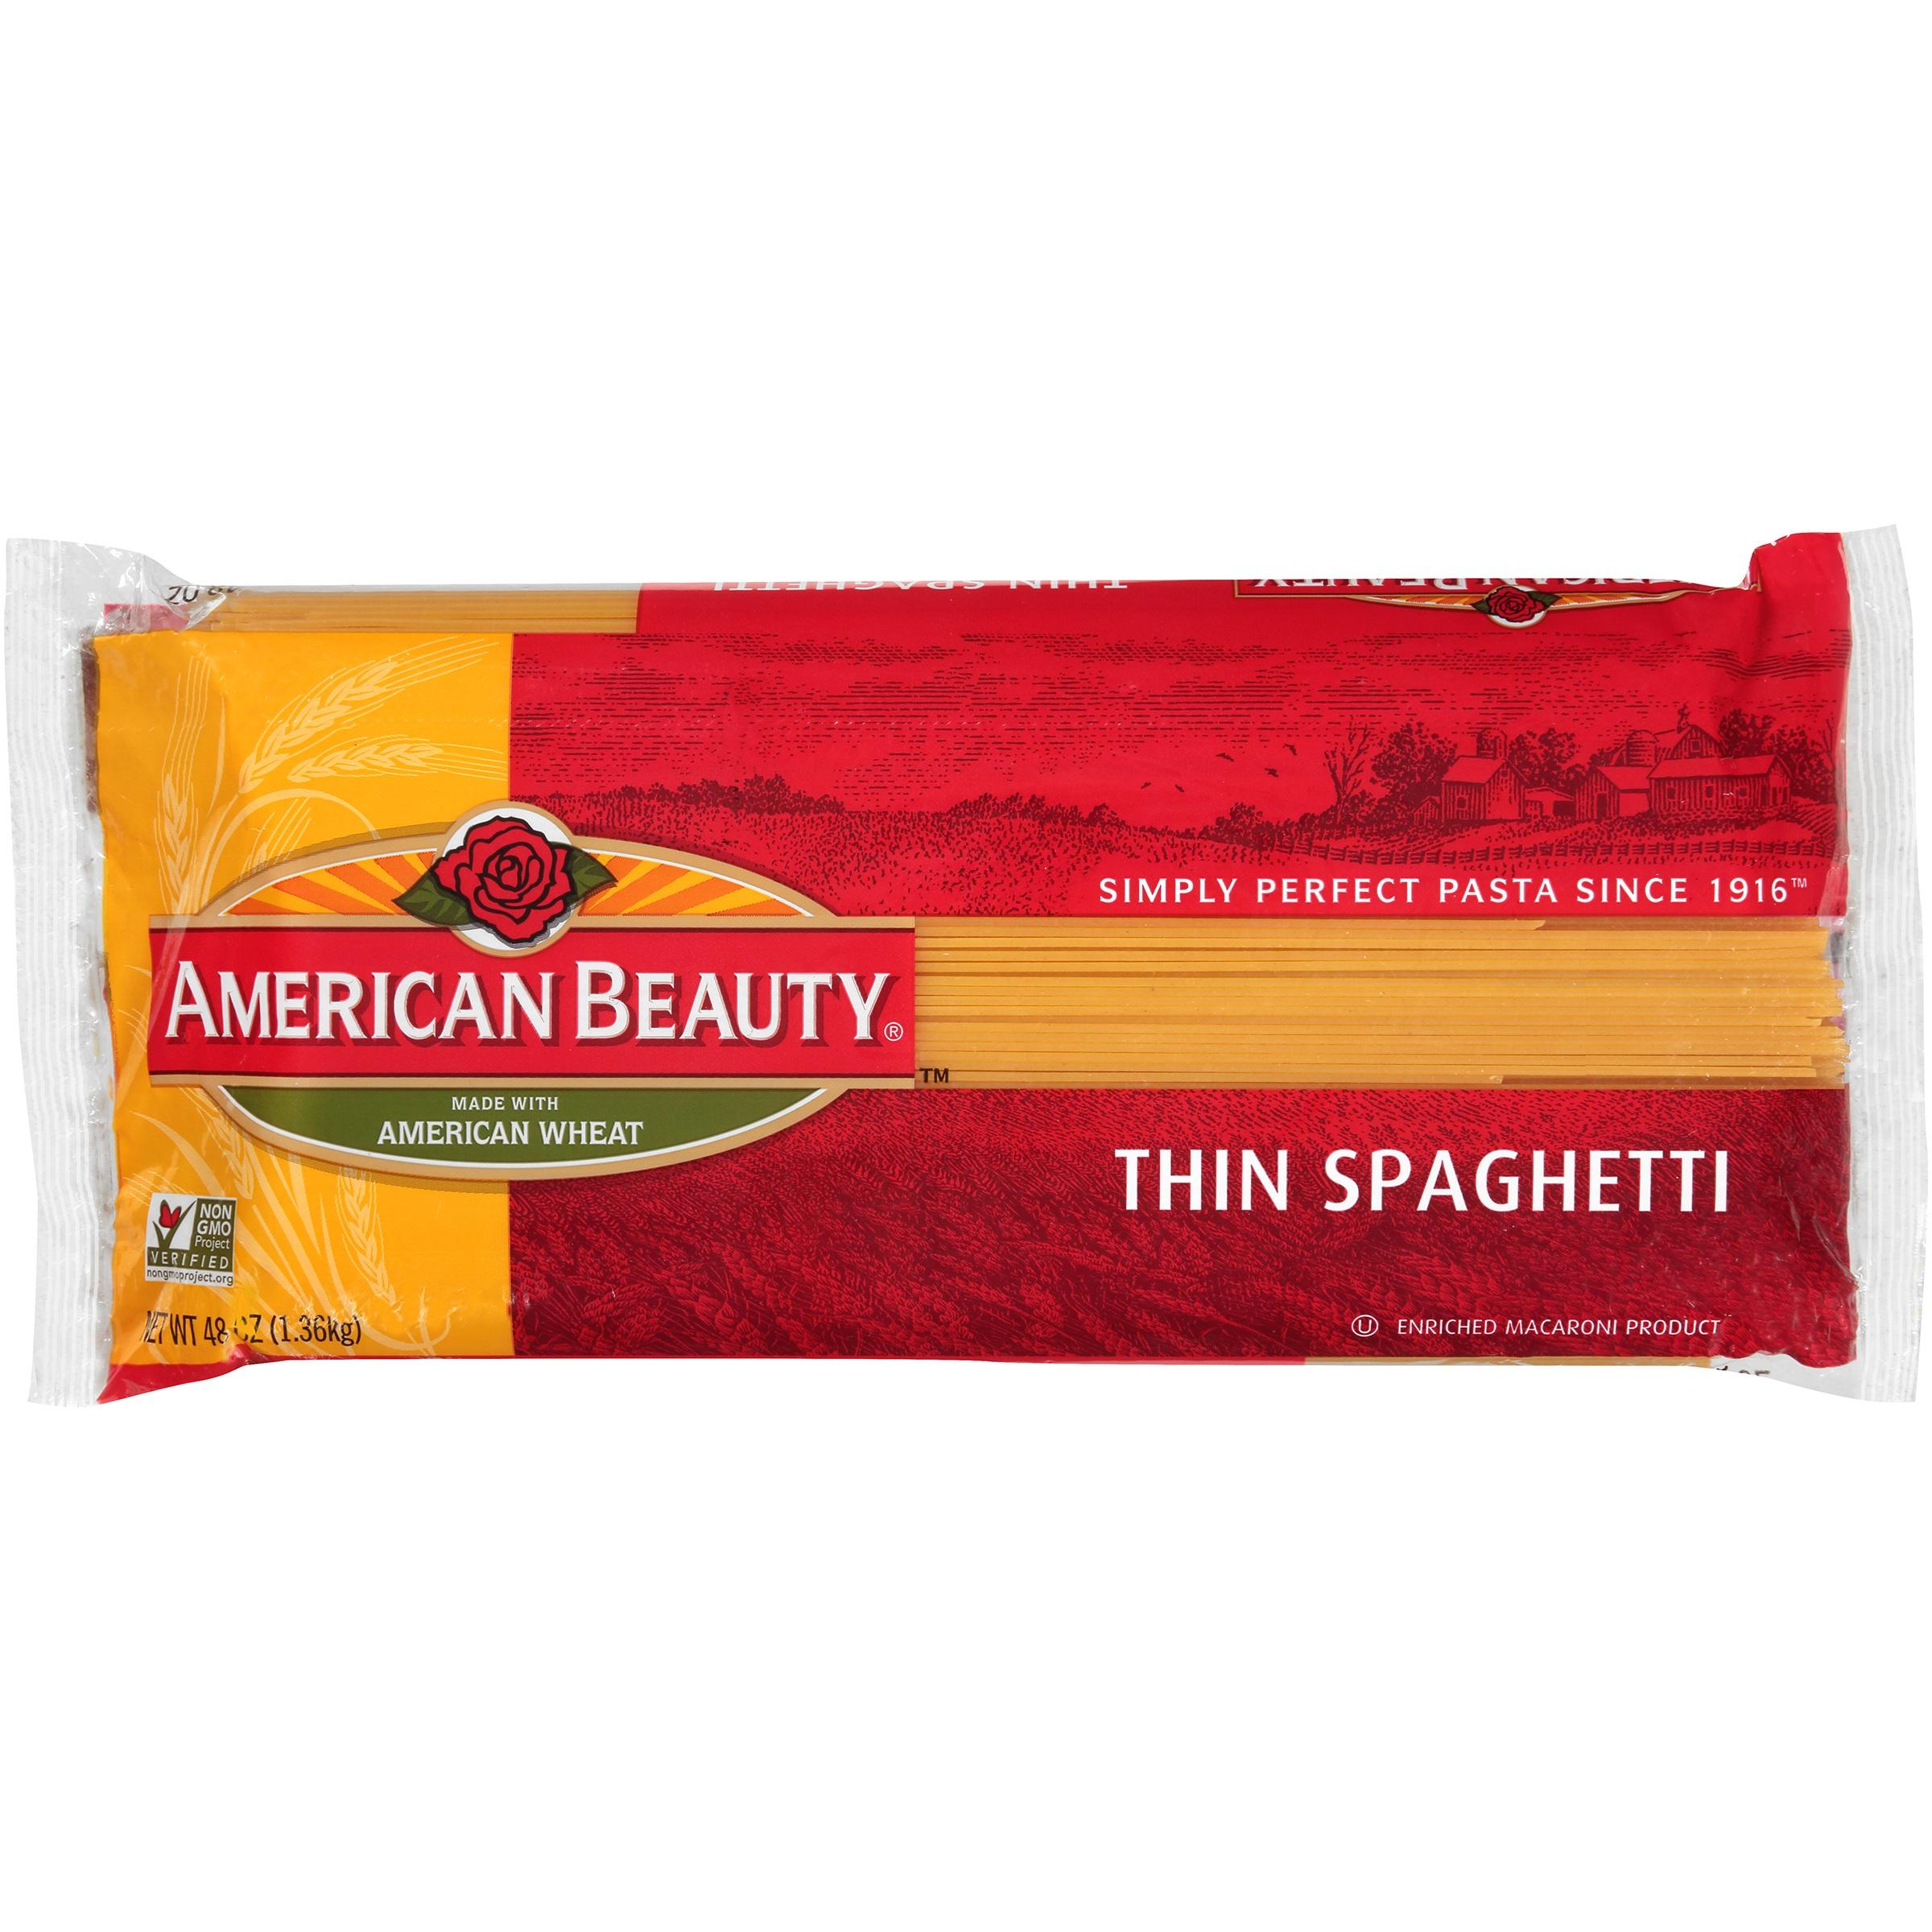 American Beauty   Thin Spaghetti  48 Oz Bag